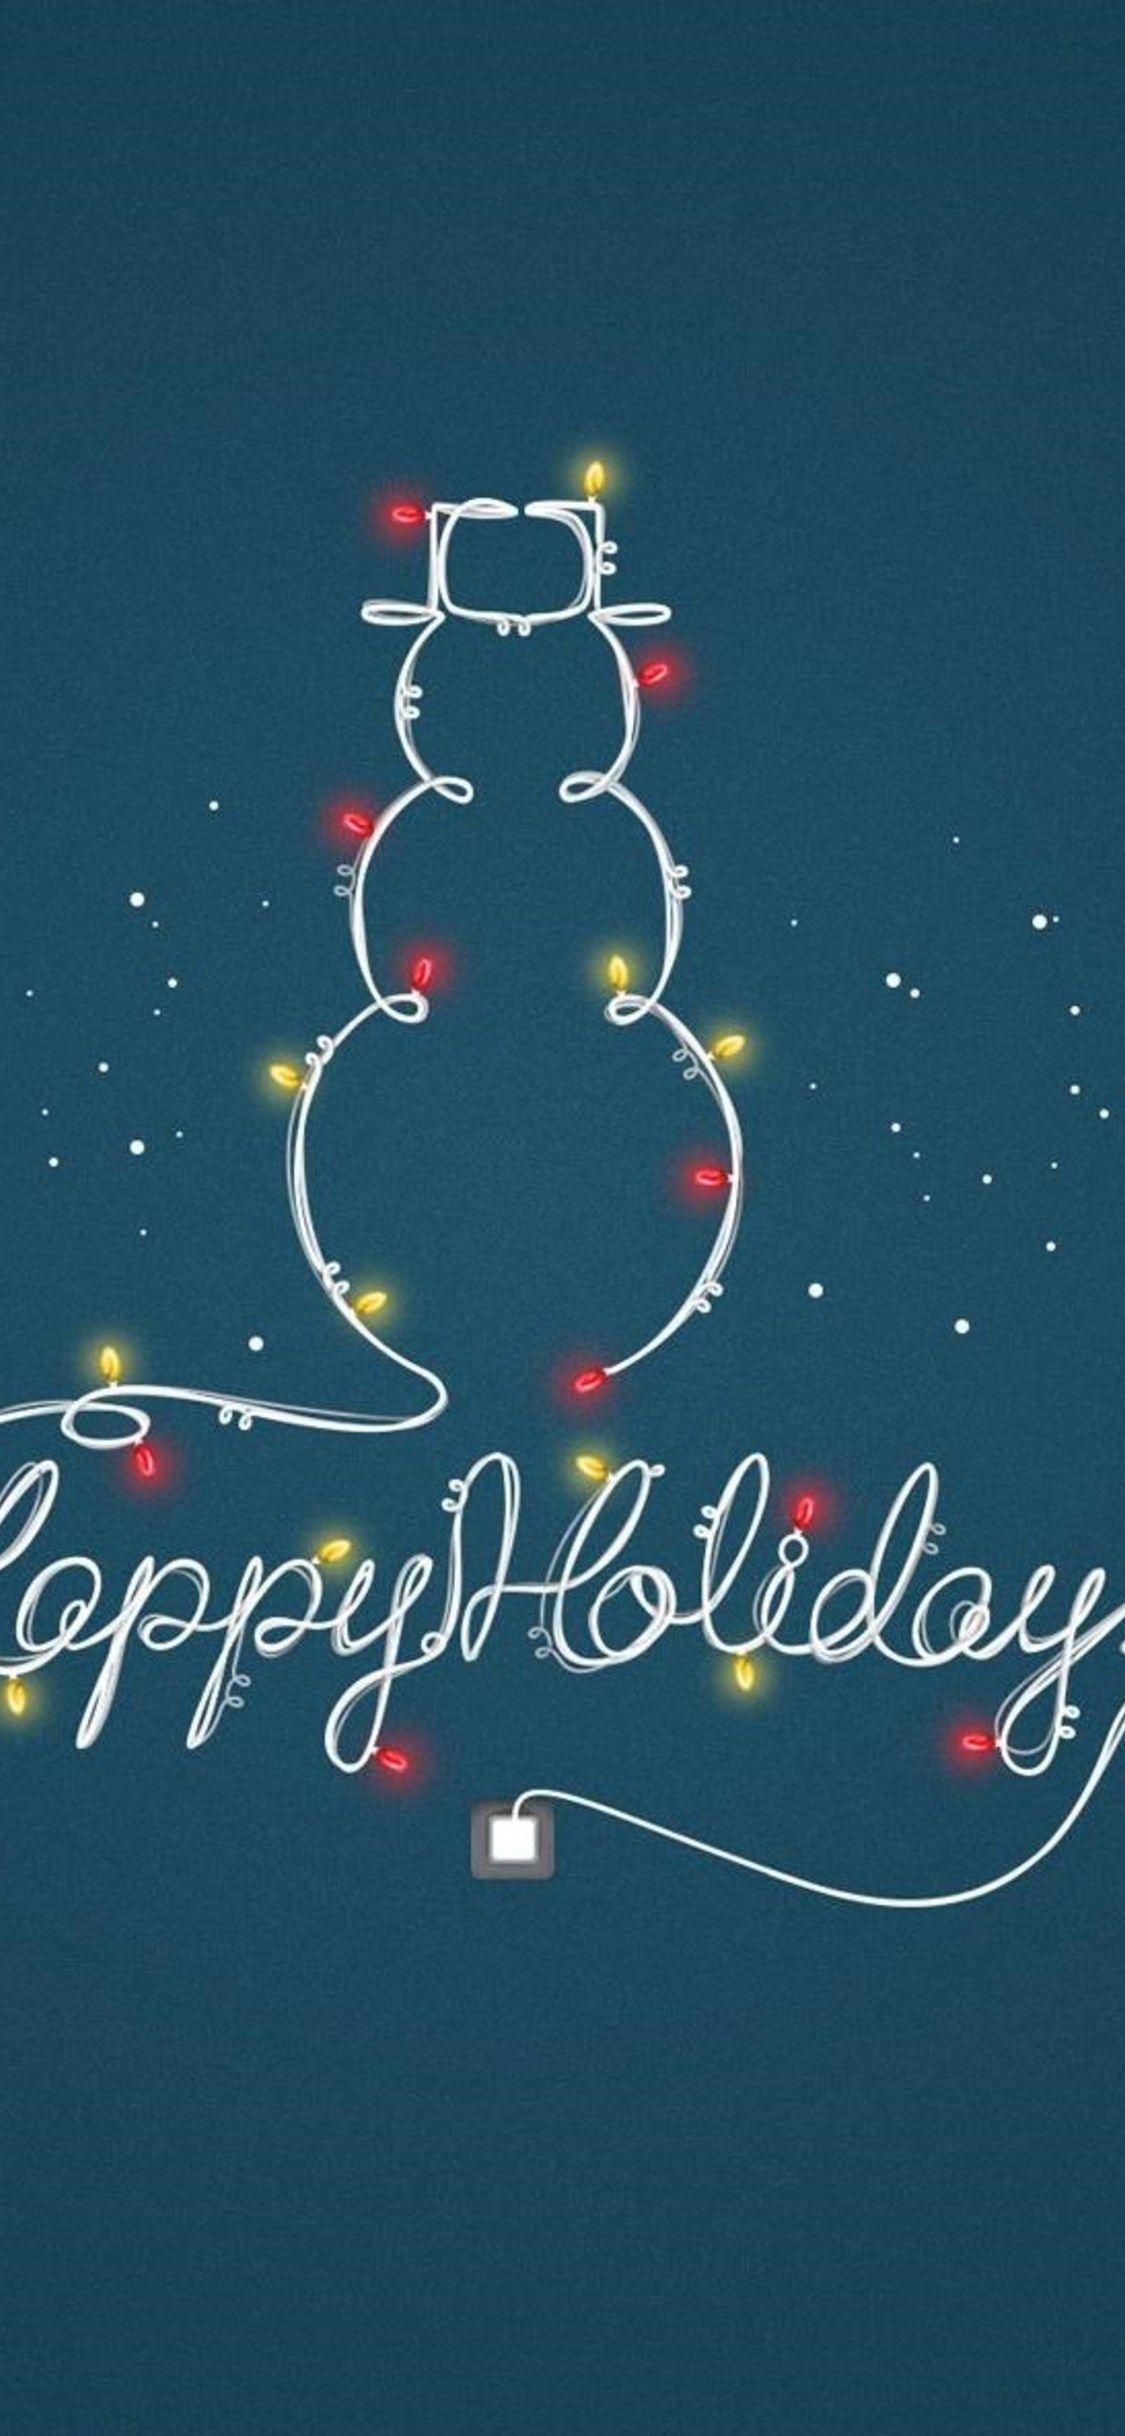 Minimalist Christmas Wallpapers Top Free Minimalist